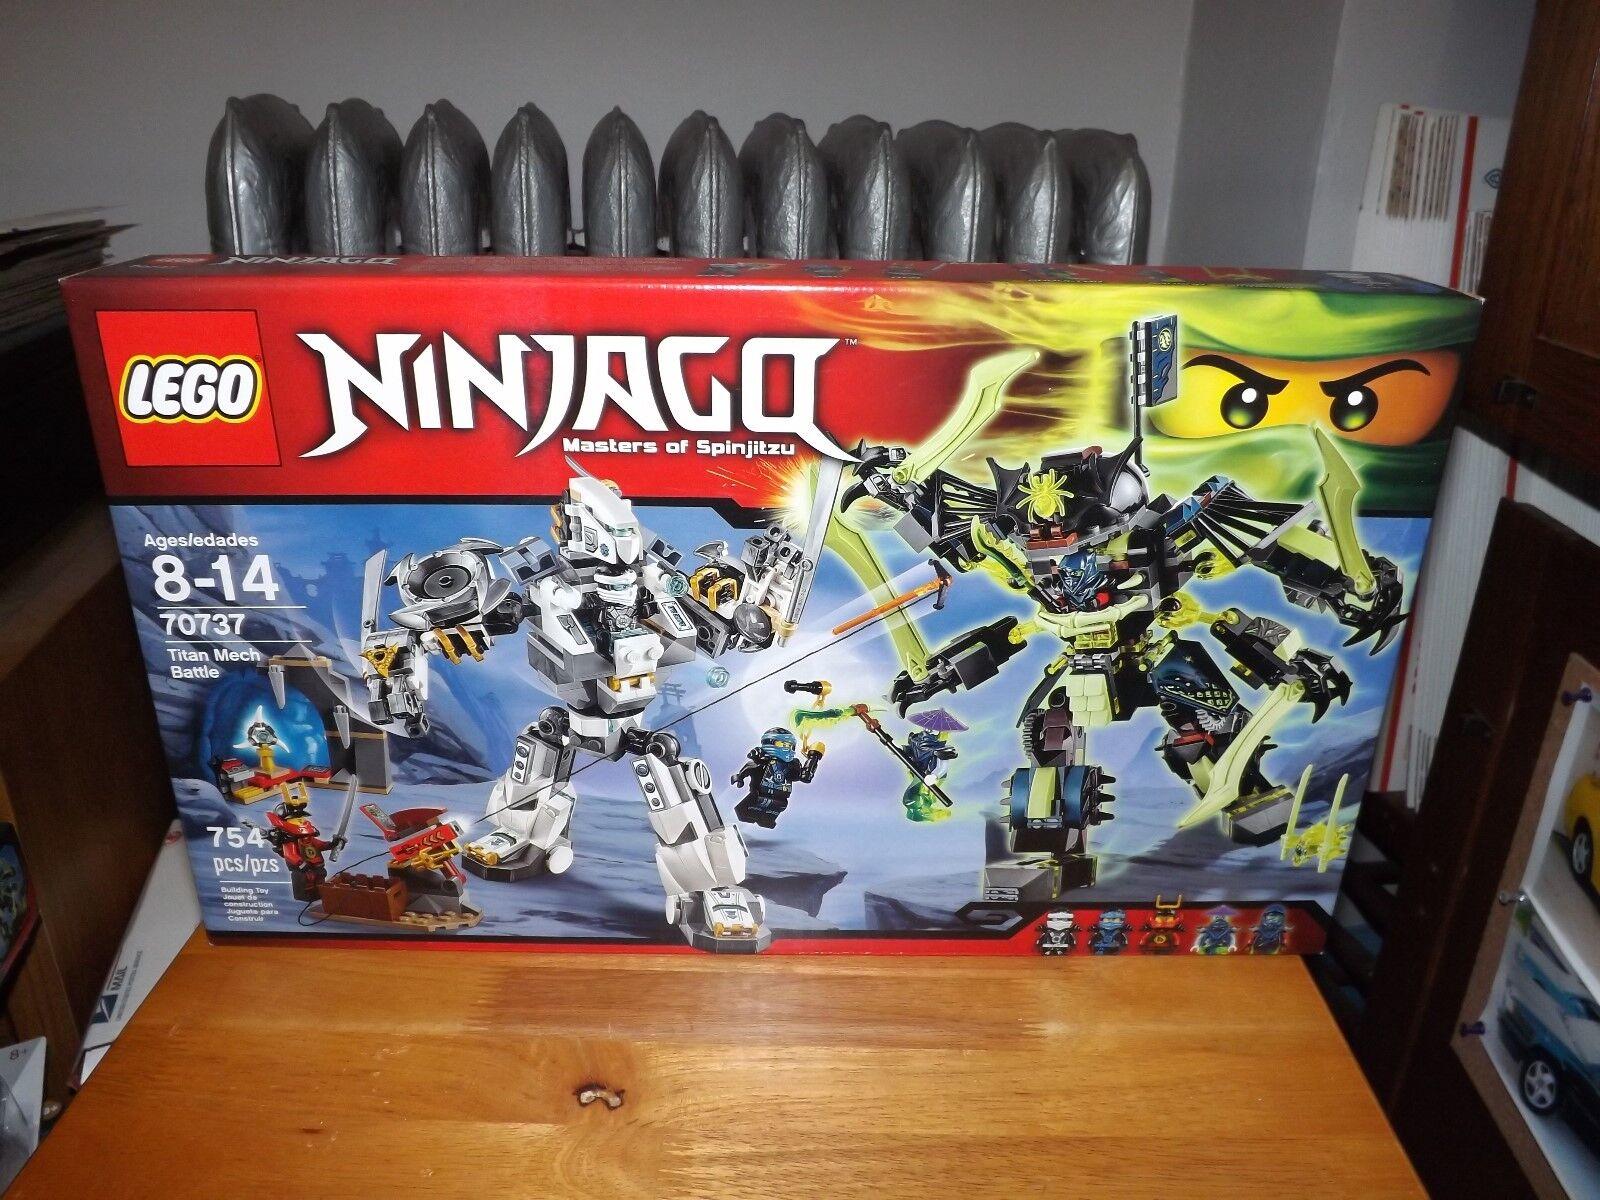 LEGO, NINJAGO, TITAN MECH BATTLE, KIT  70737, 754 PIECES, NIB, 2015